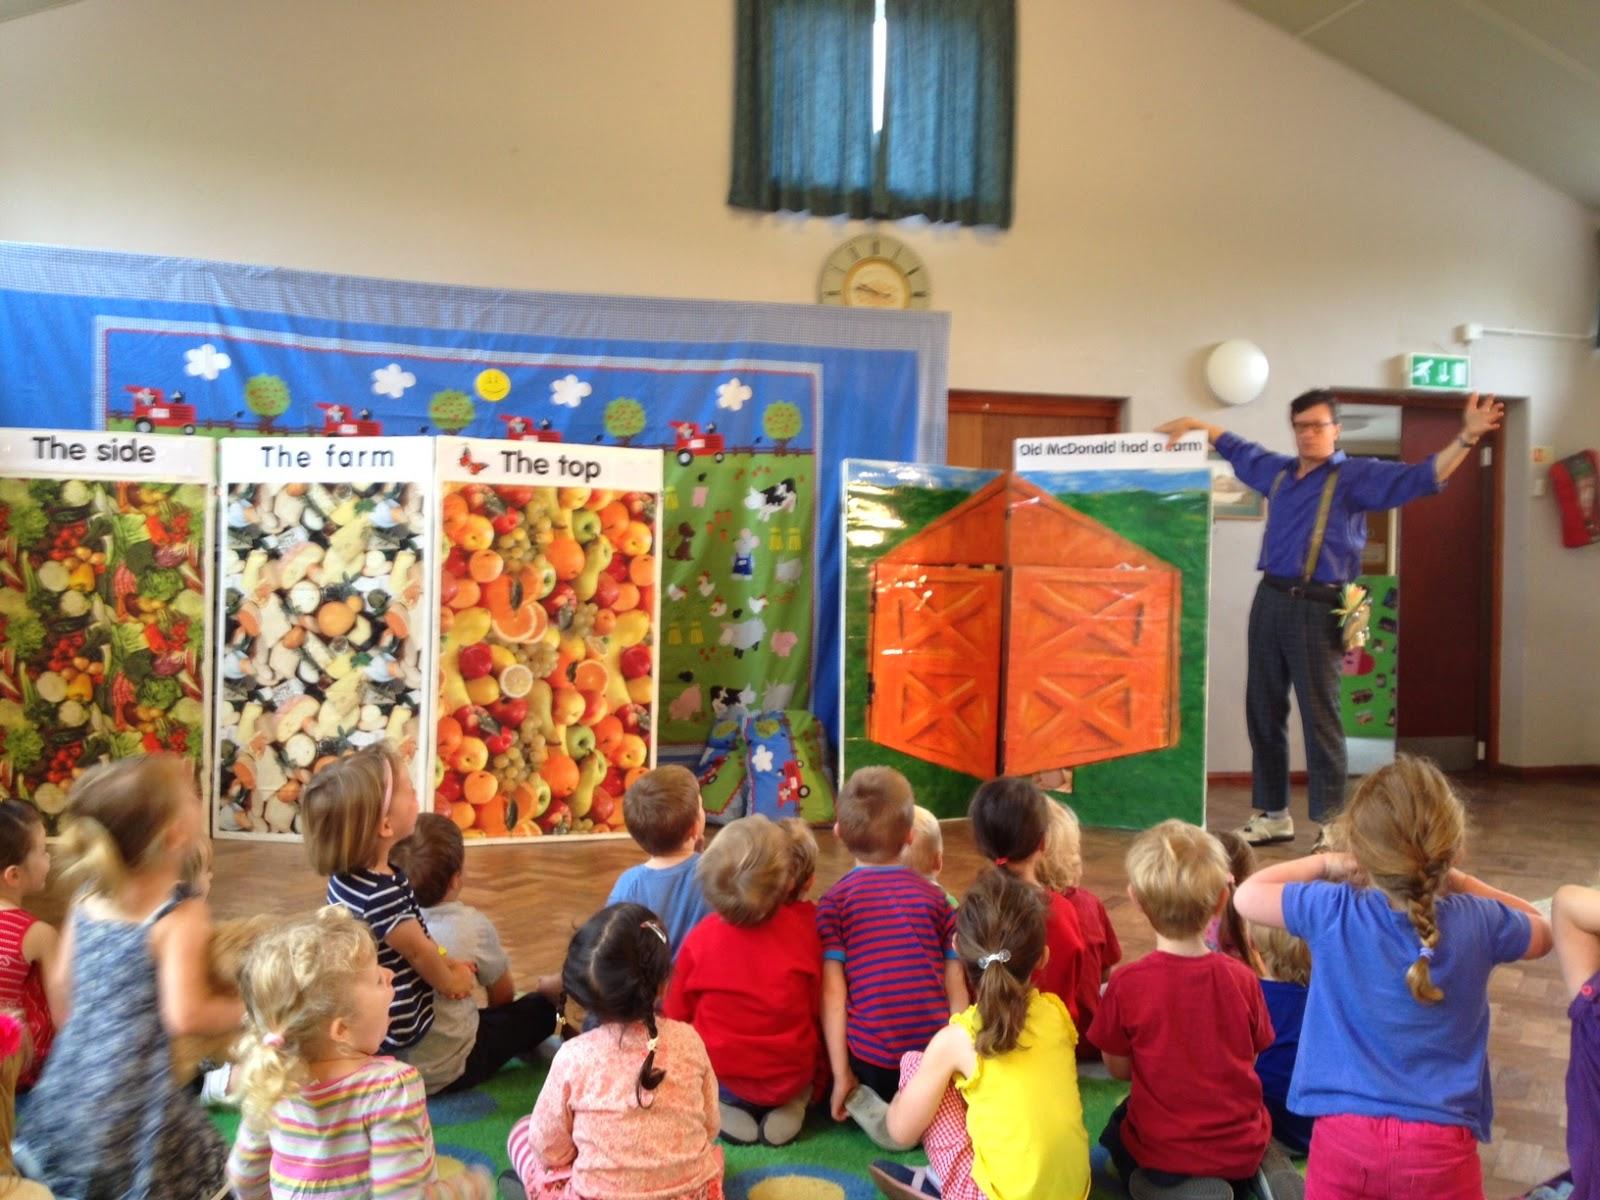 Primary School Show in Hertfordshire